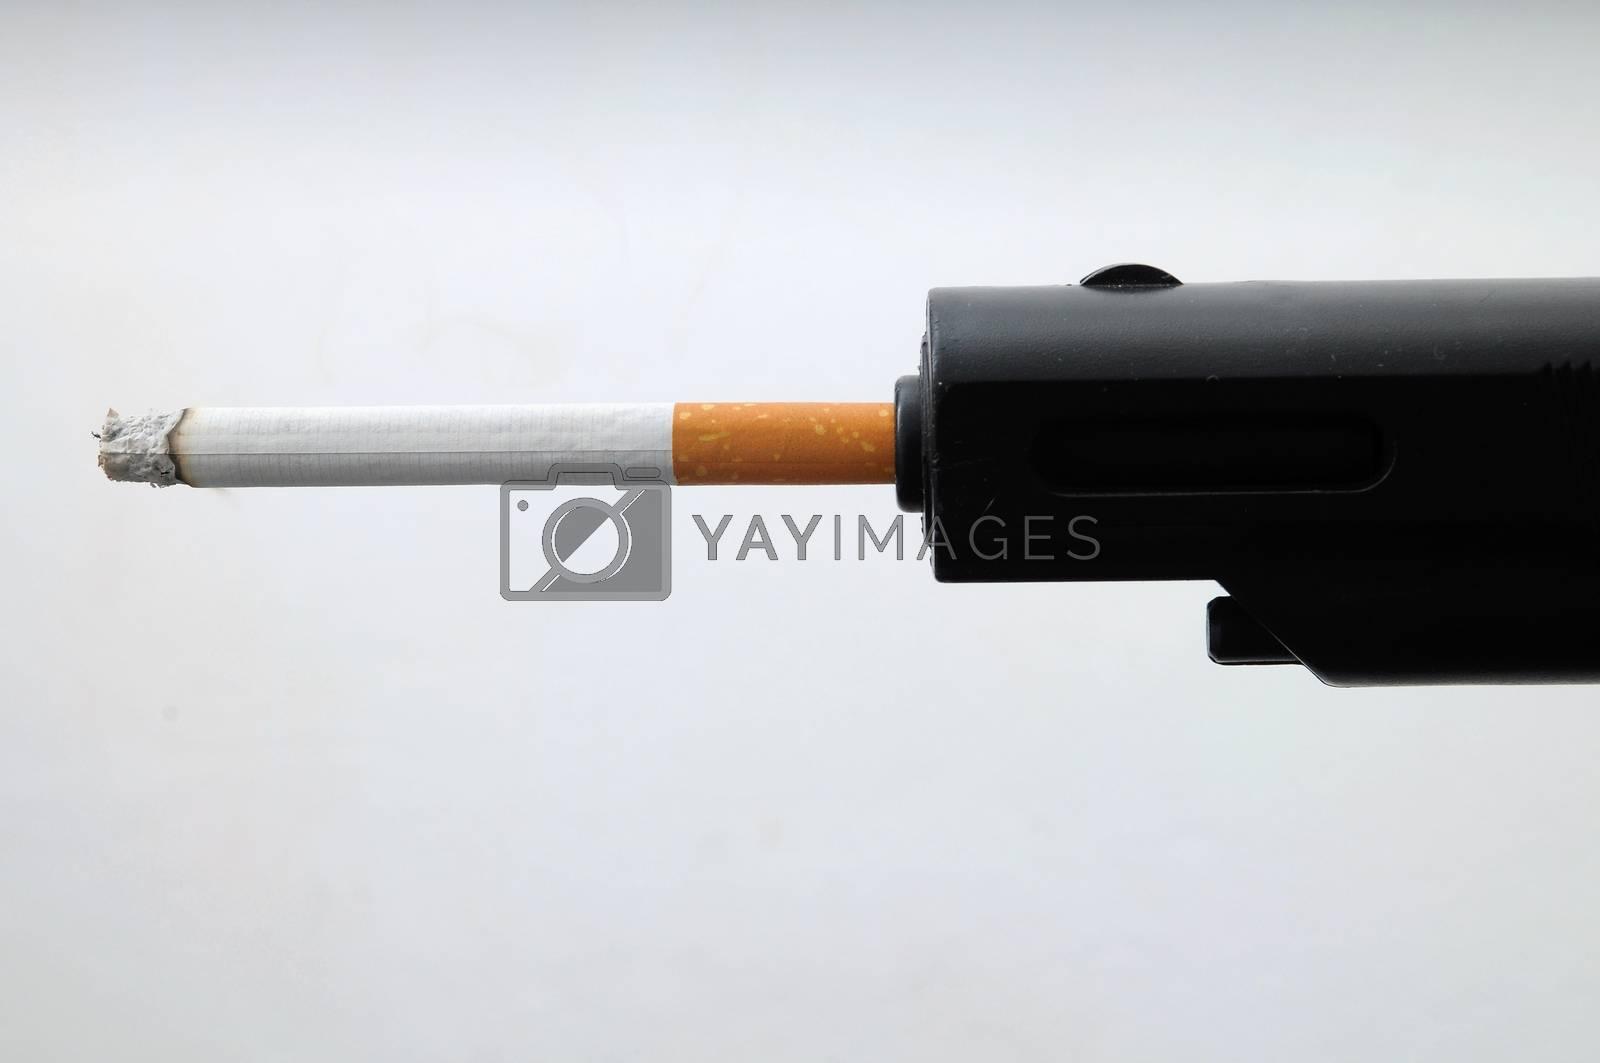 Black Gun Shooting Cigarette on a White Background